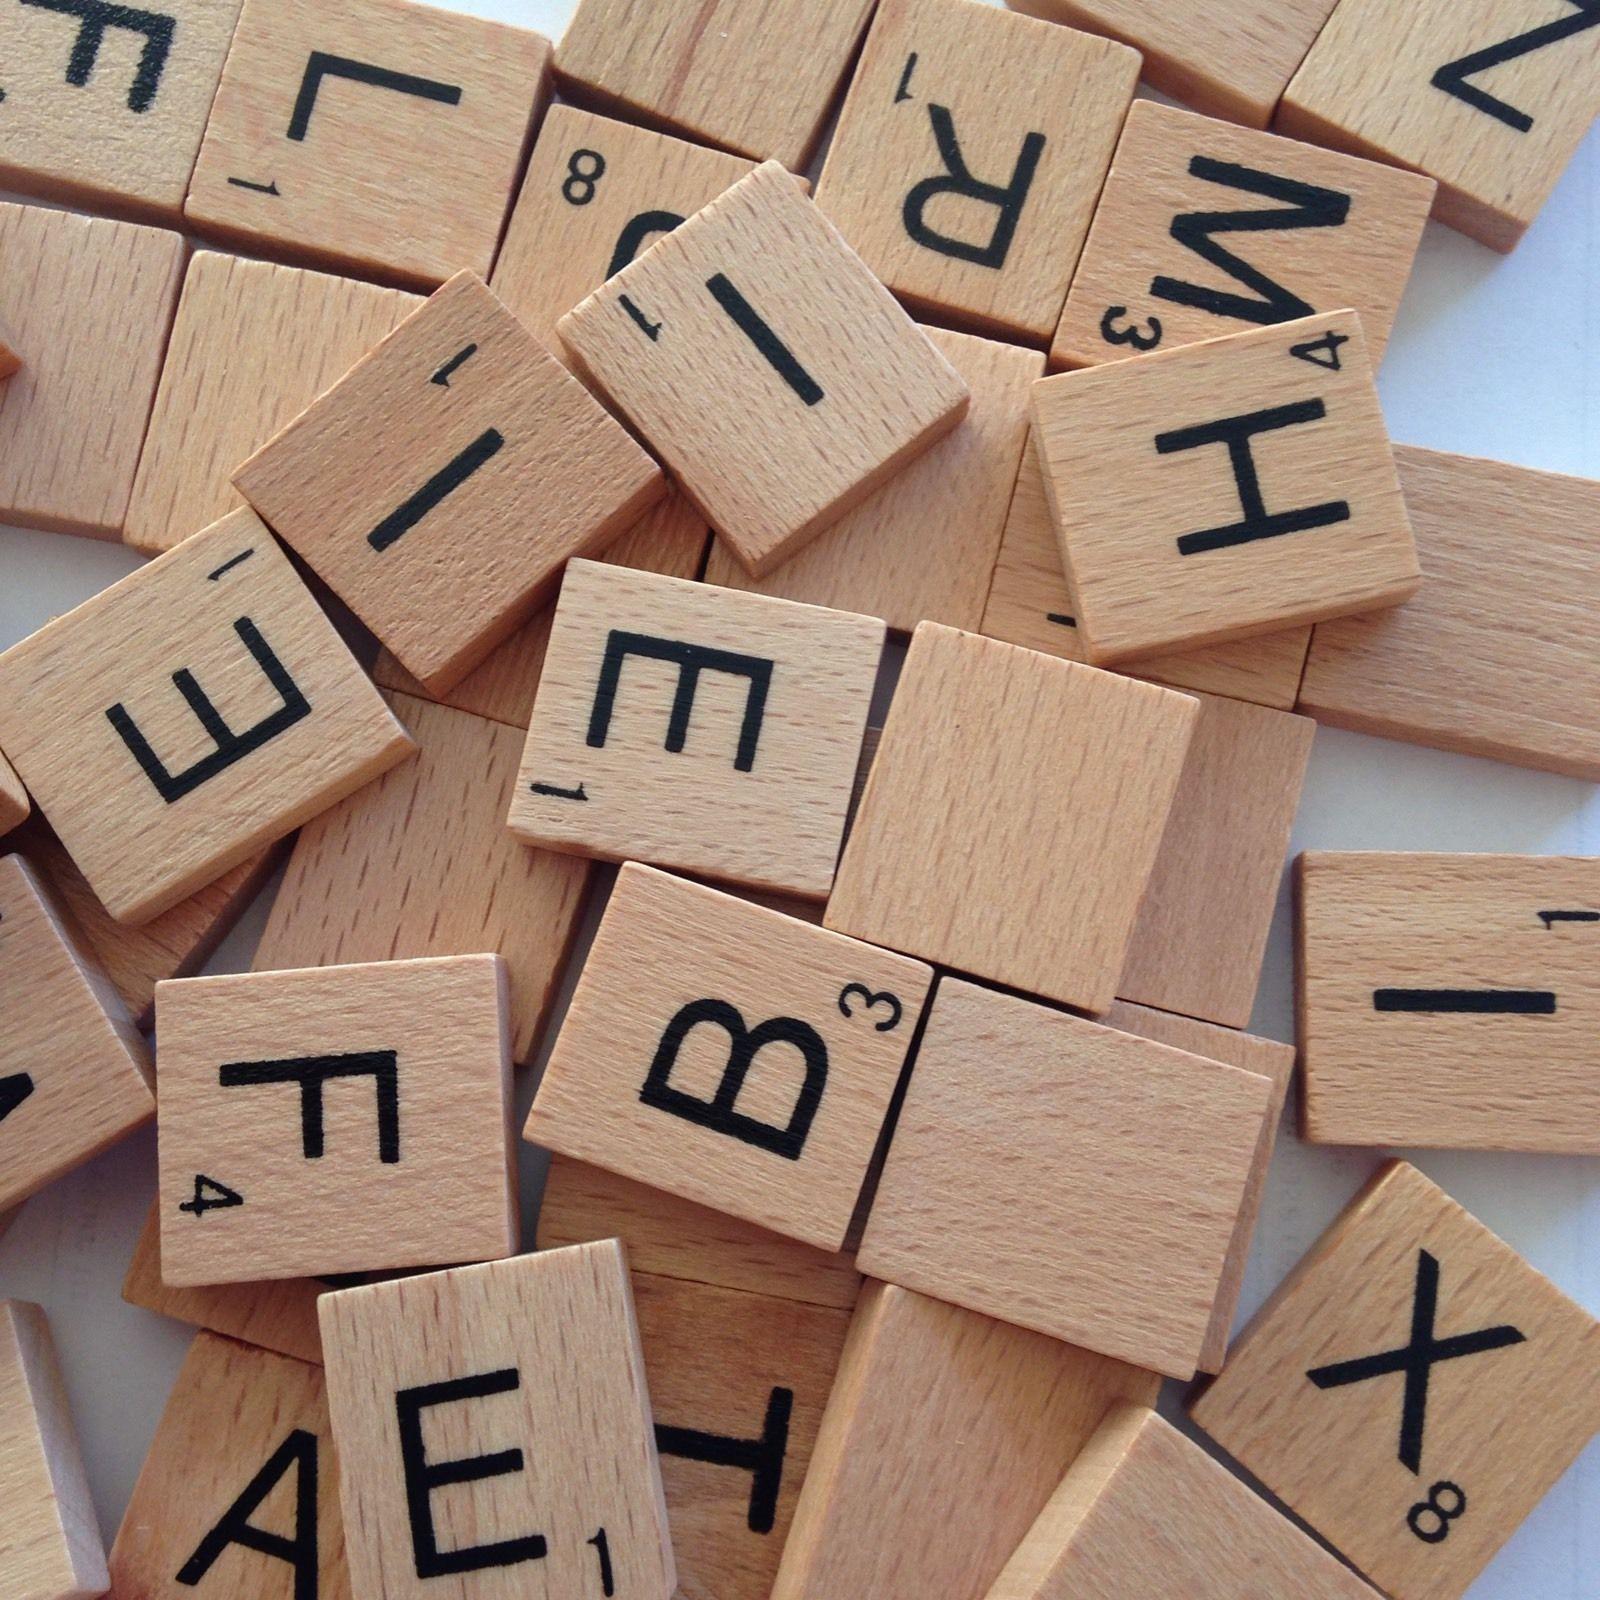 100 x Black Scrabble Tiles letters Tile Craft Complete wooden Set  High Quality